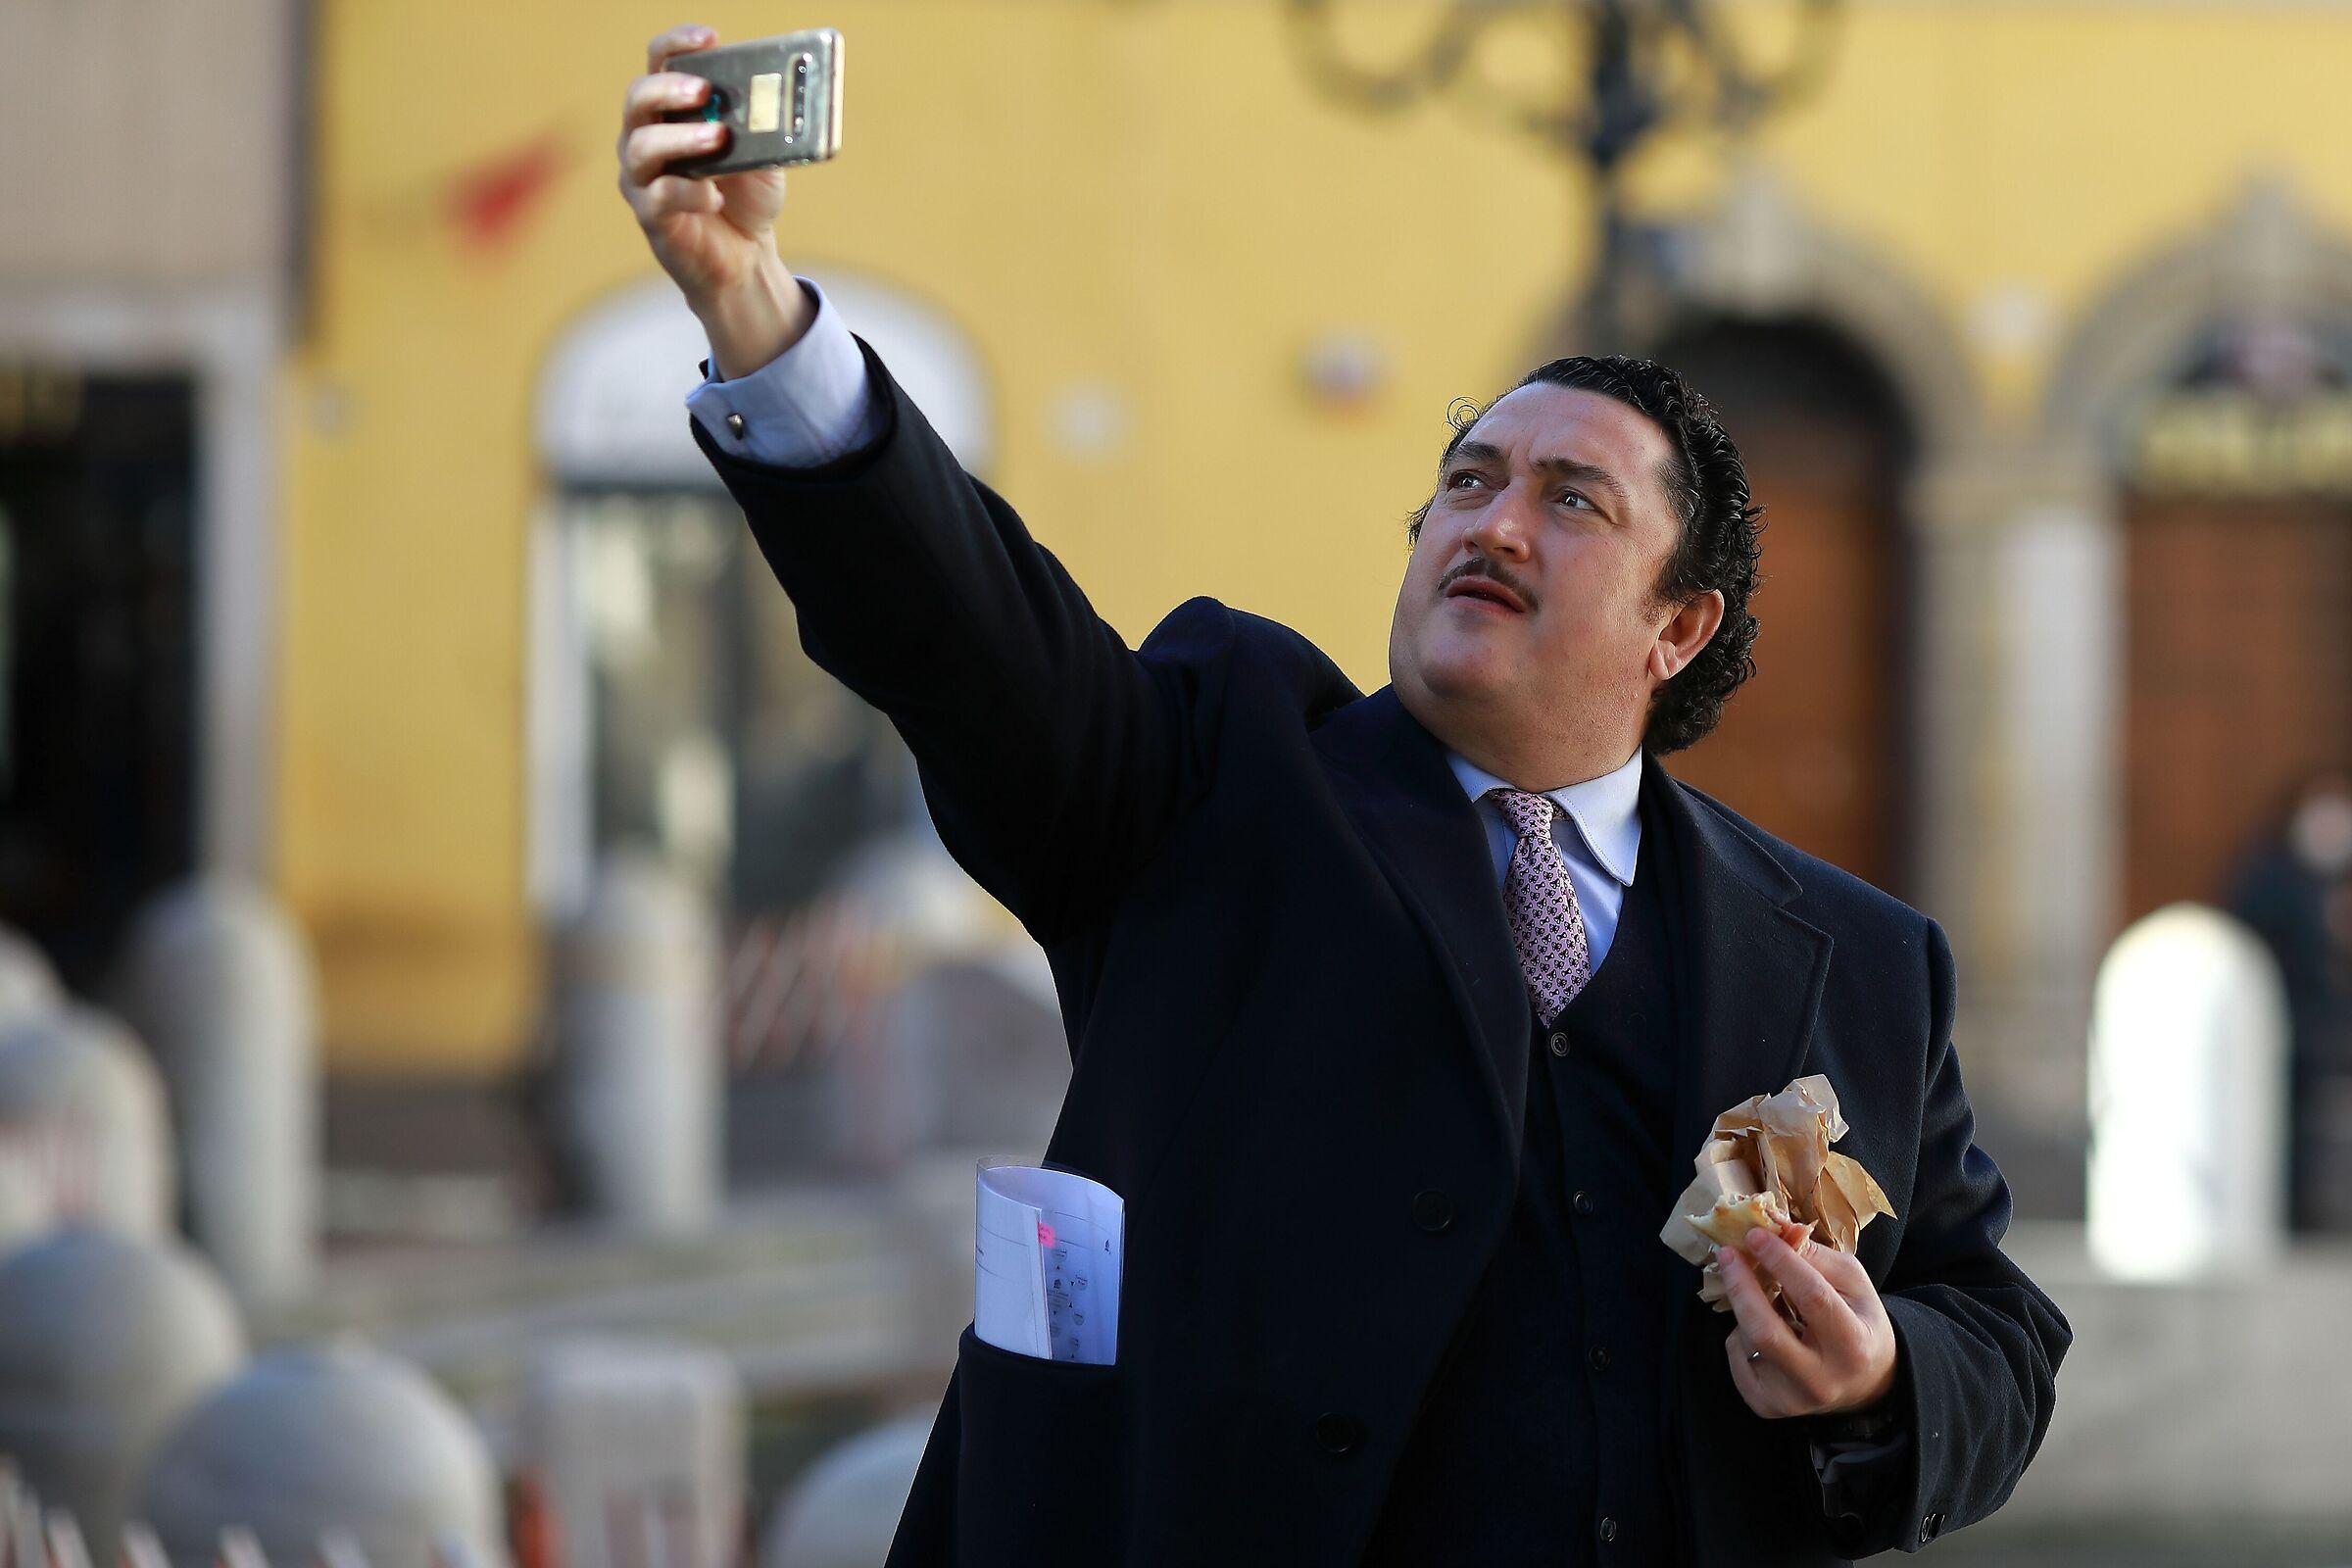 Selfie, l'irresistibile tentazione...